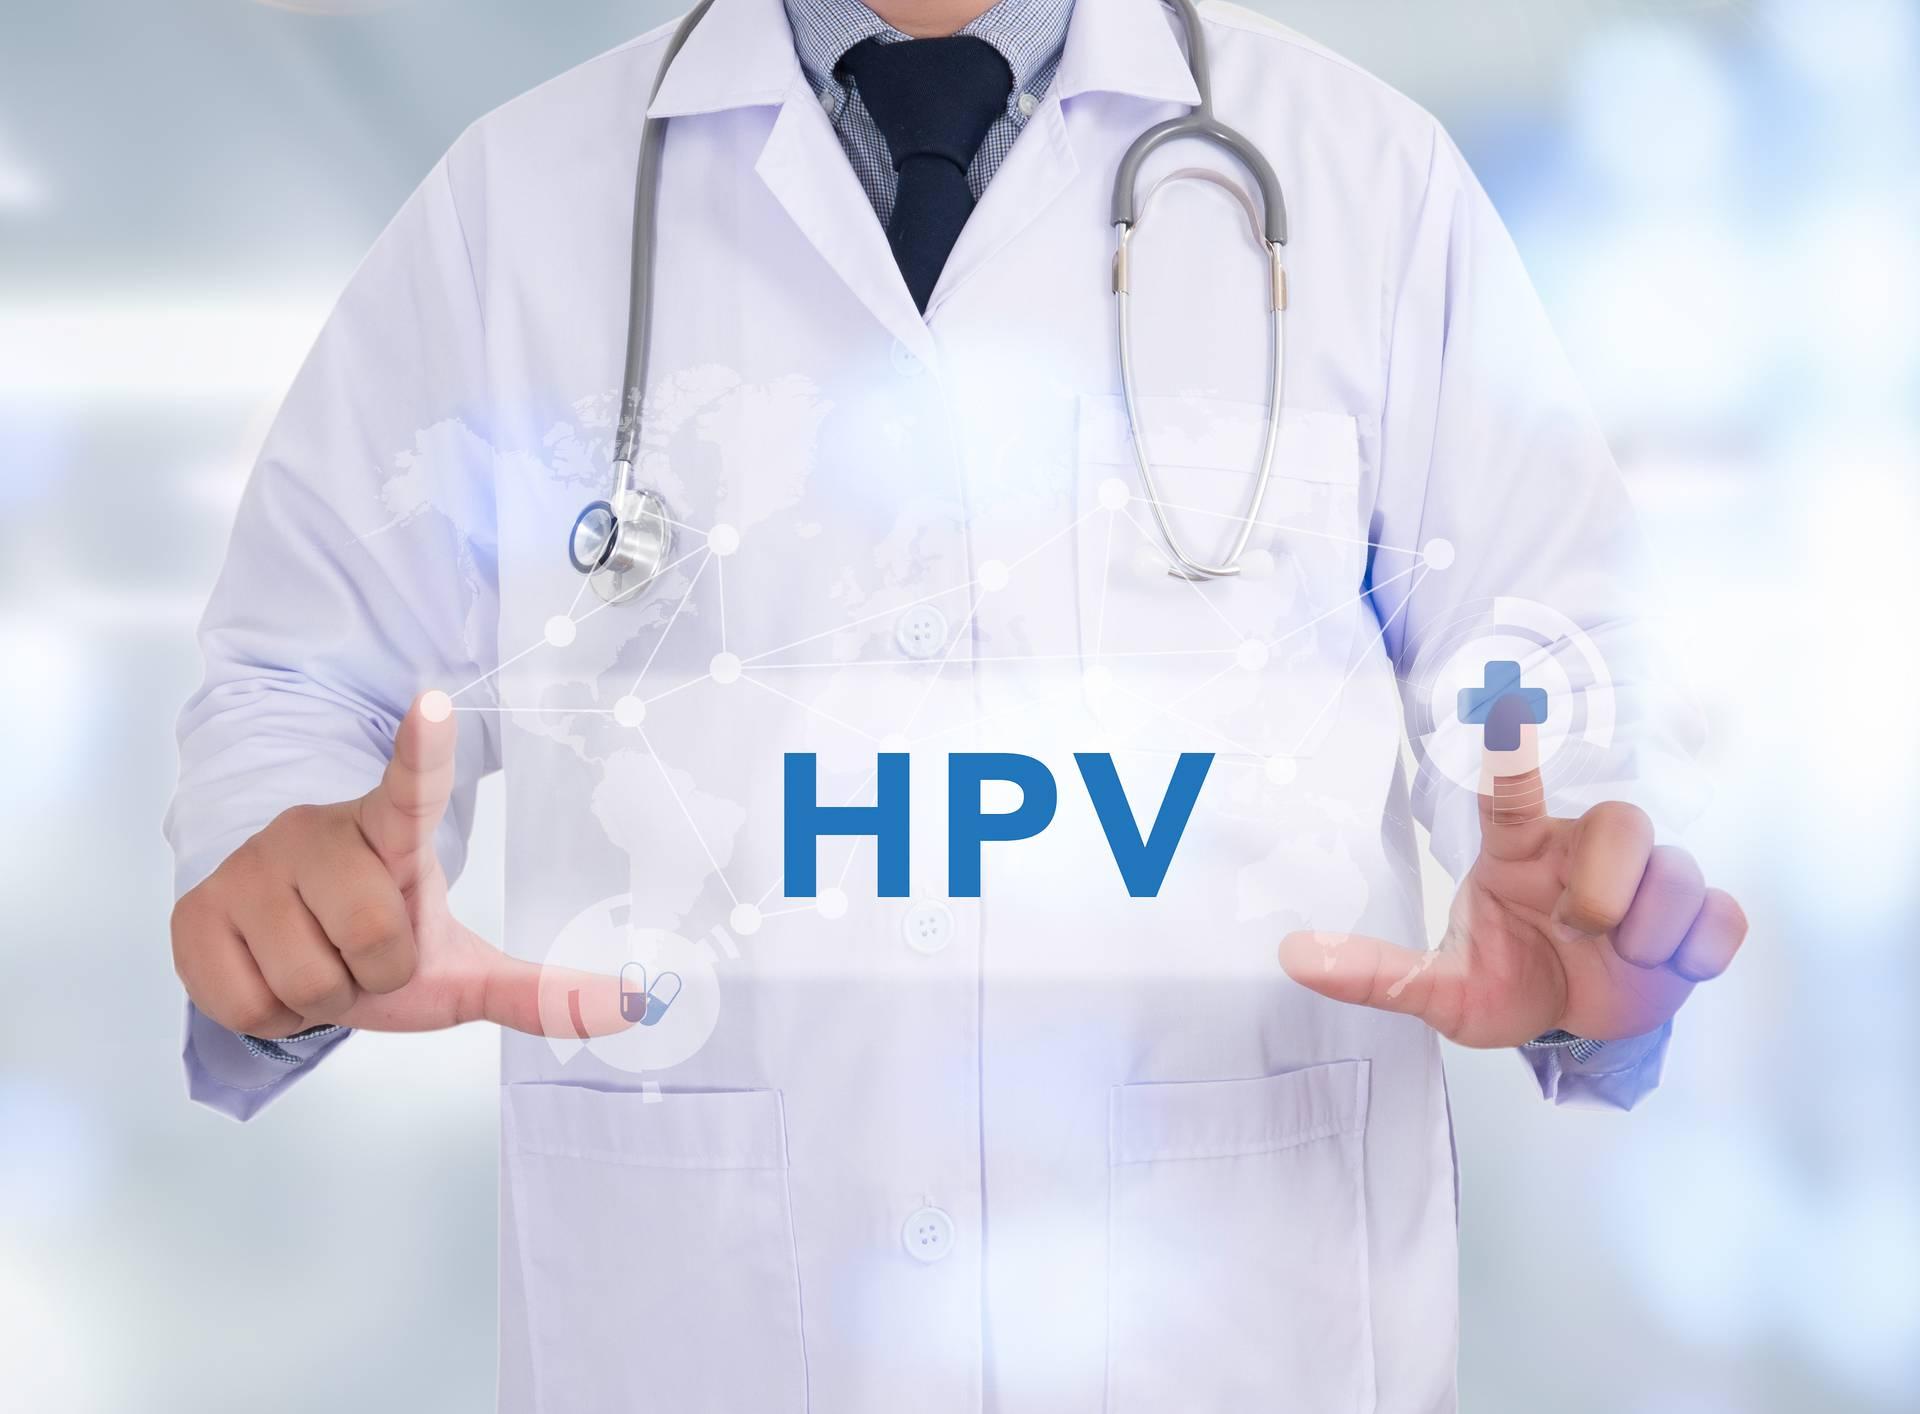 Doktor u rukama ima natpis HPV